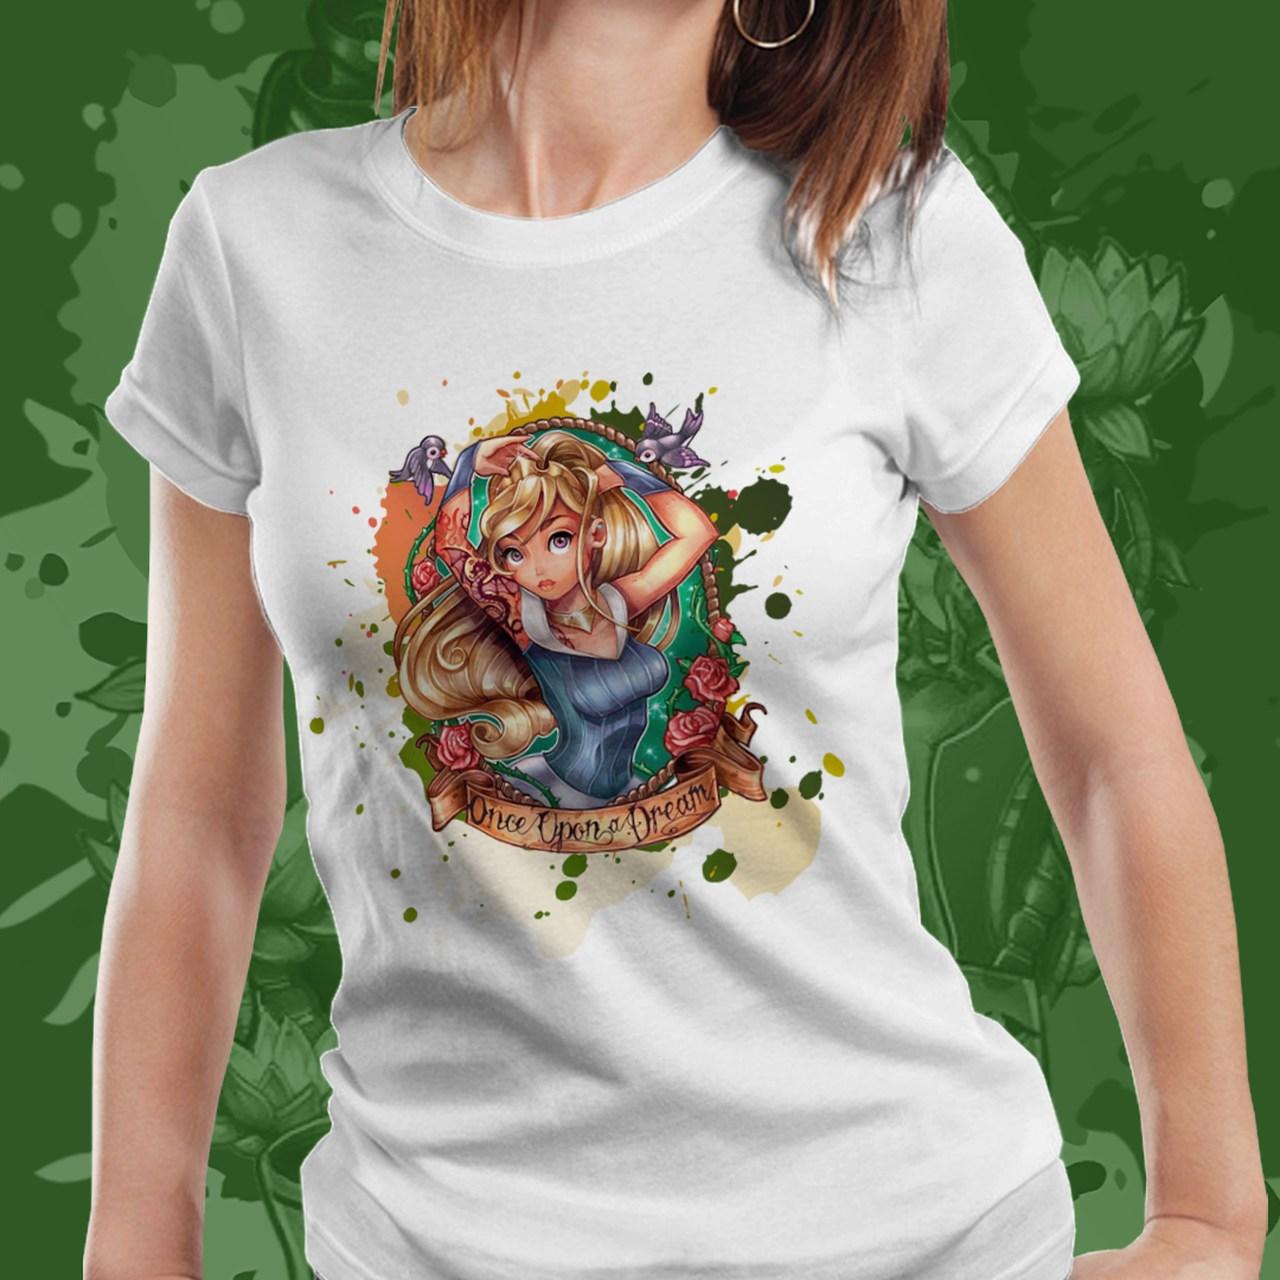 Camiseta Feminina Princesa Aurora: Bela Adormecida - Disney (Branco) - EV